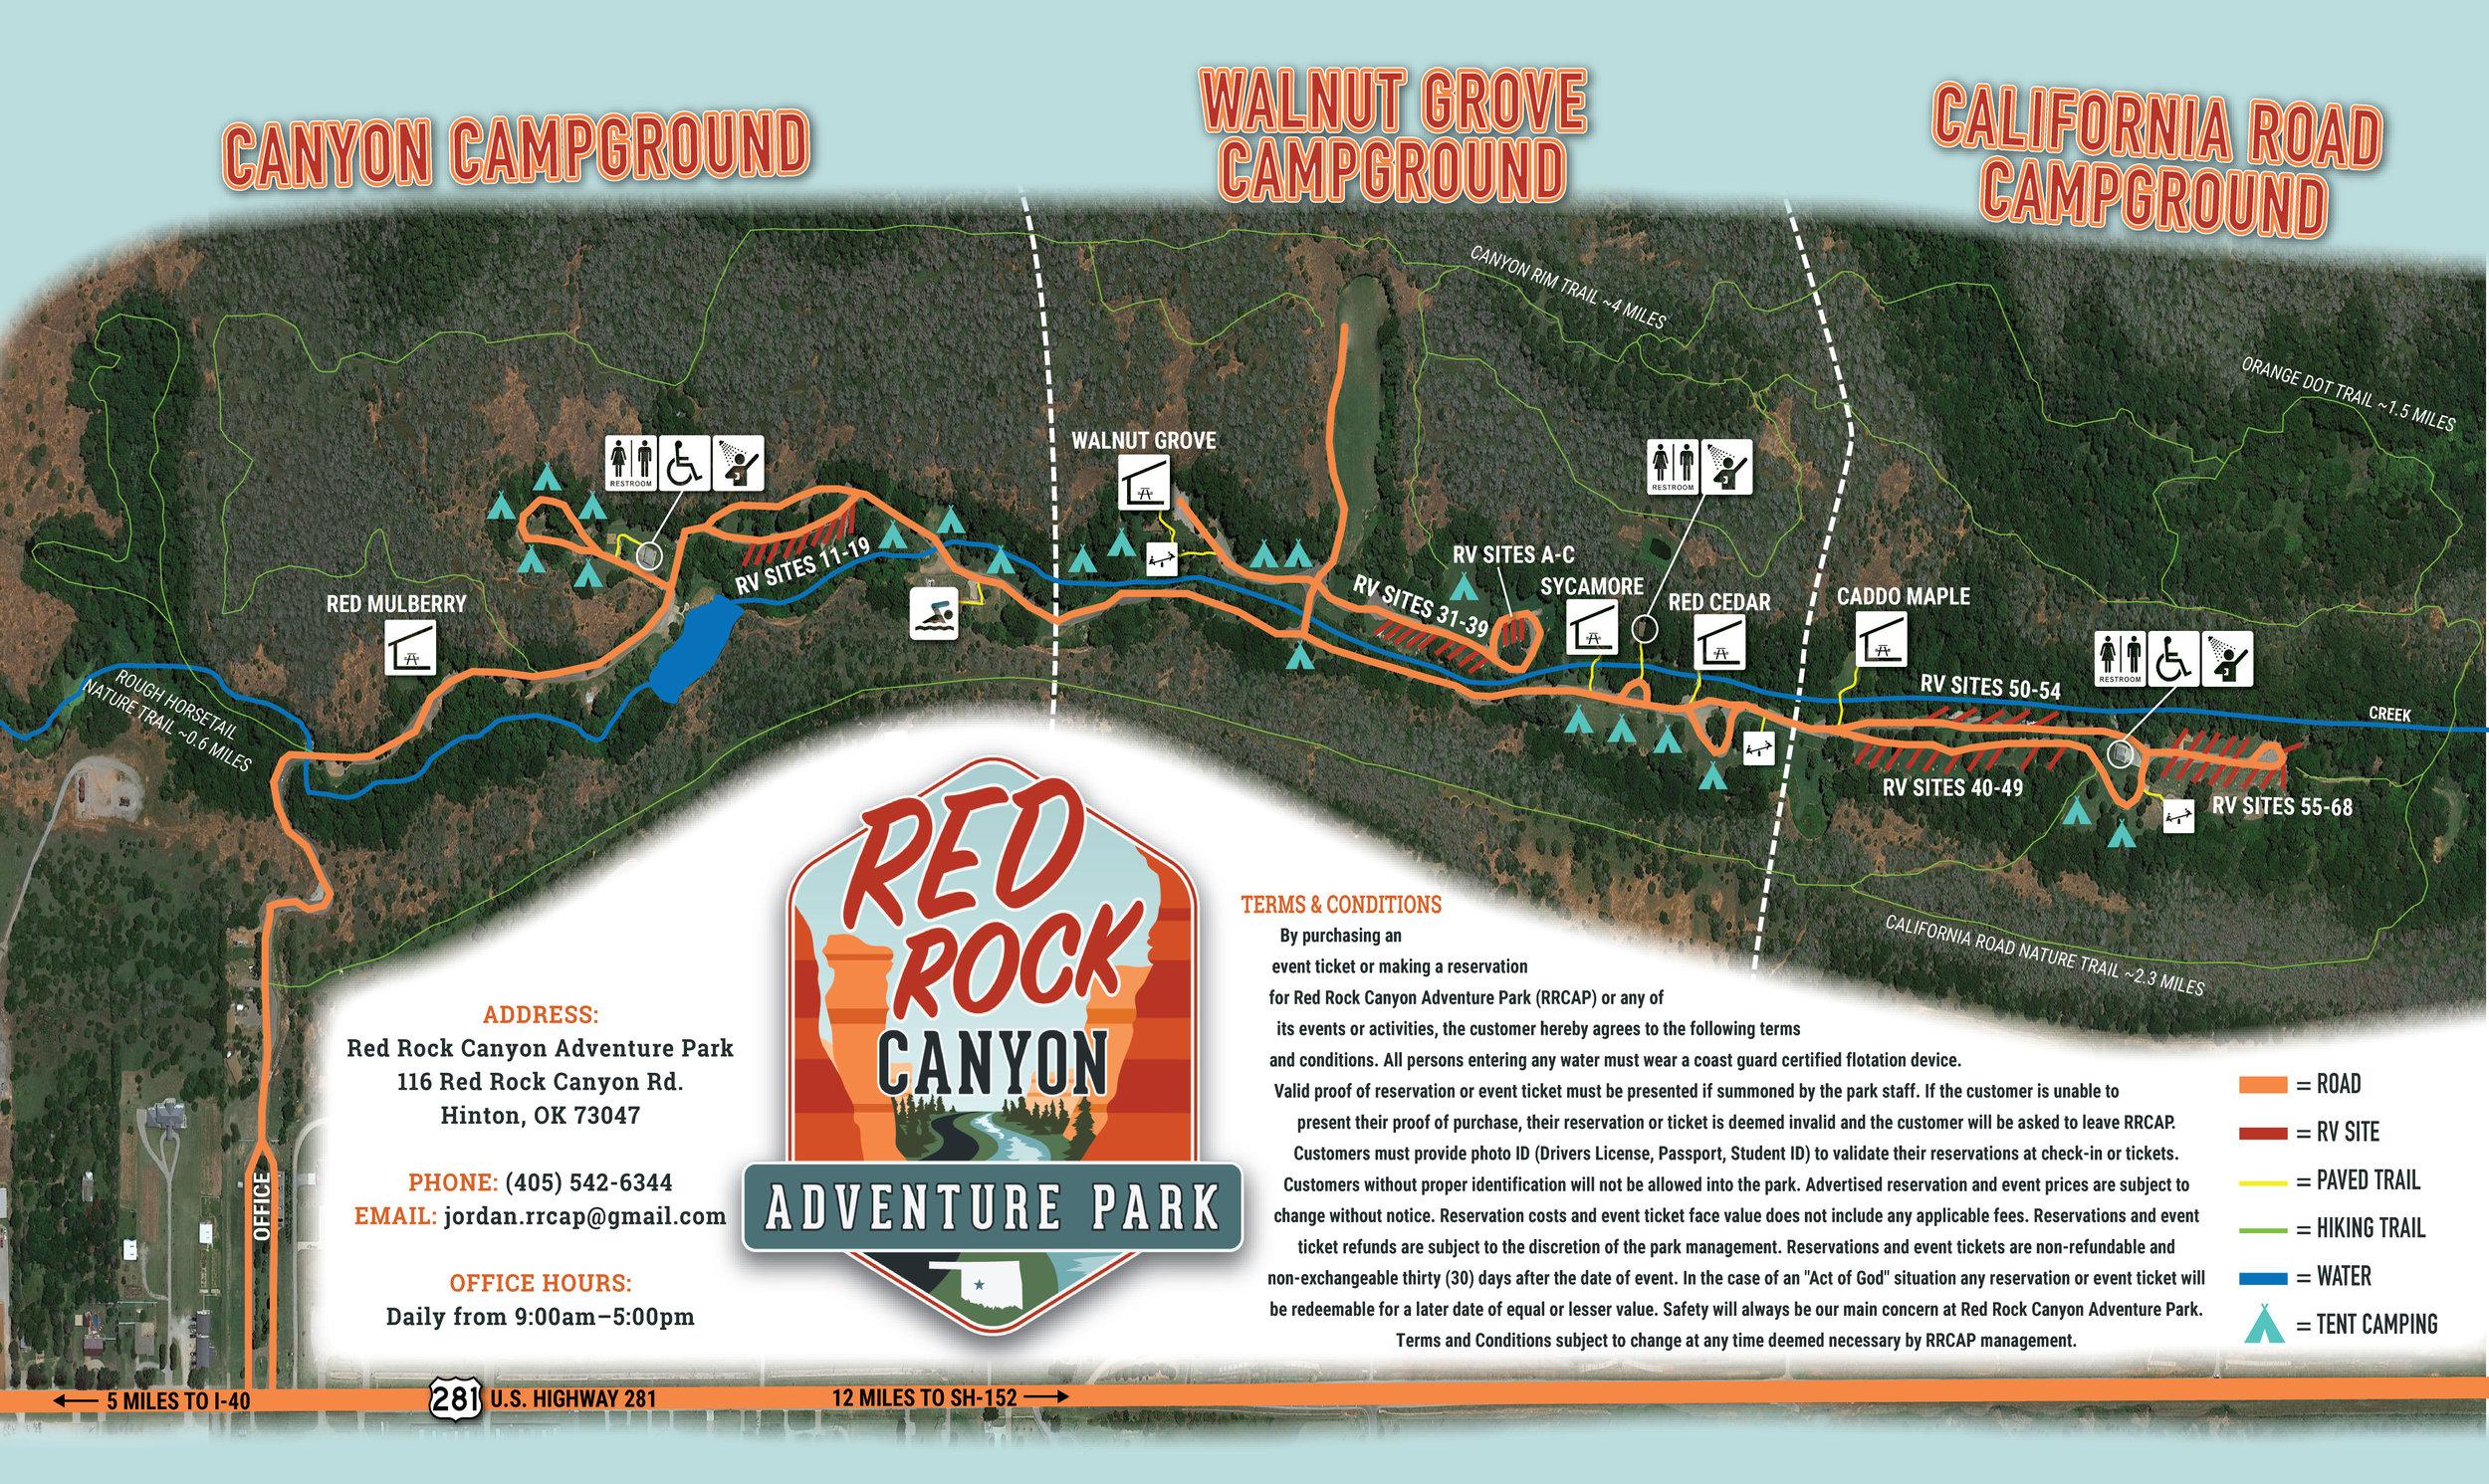 rrcap-map-pamphlet---inside2.jpeg